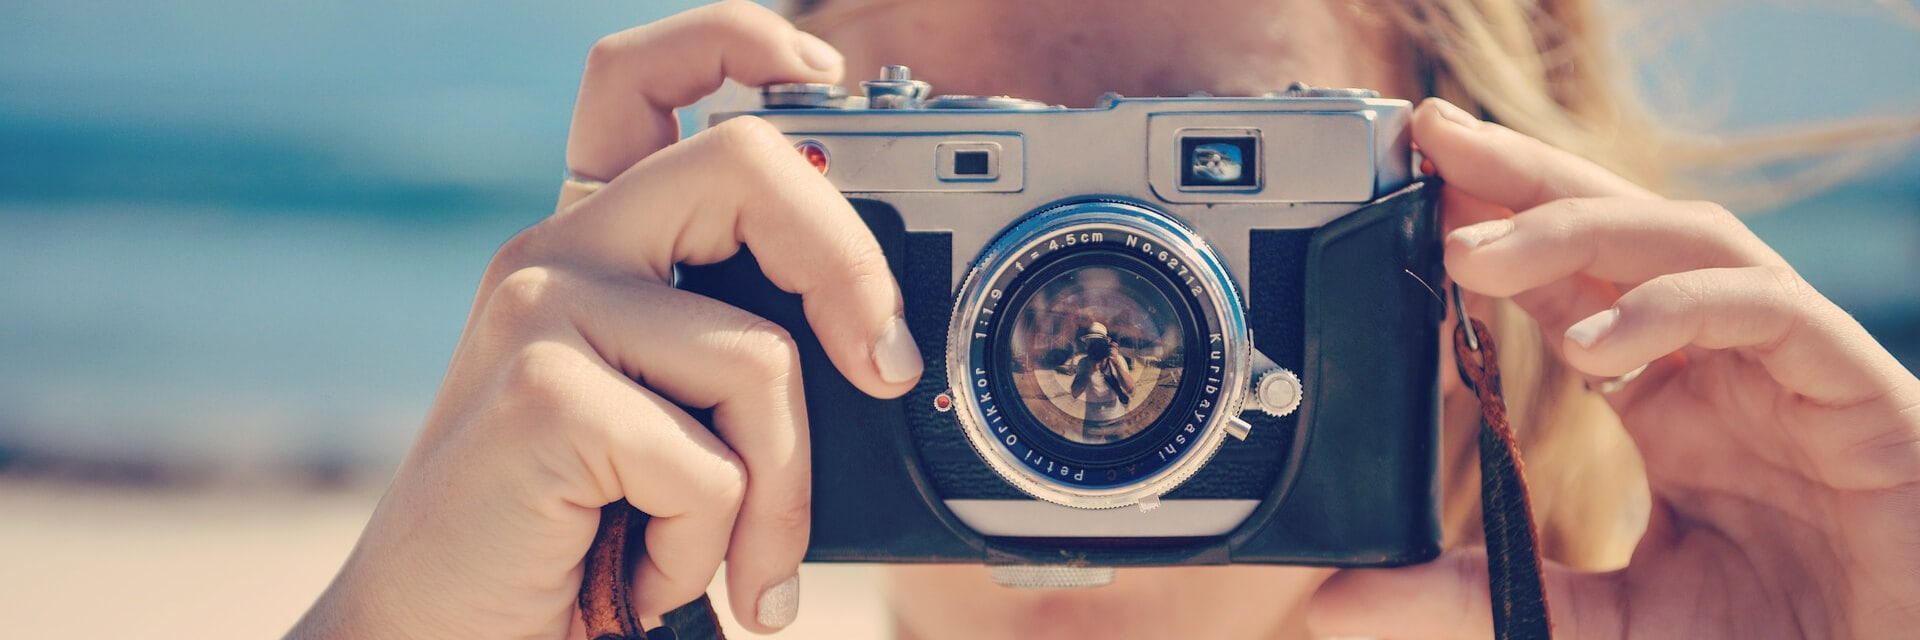 camera_naked